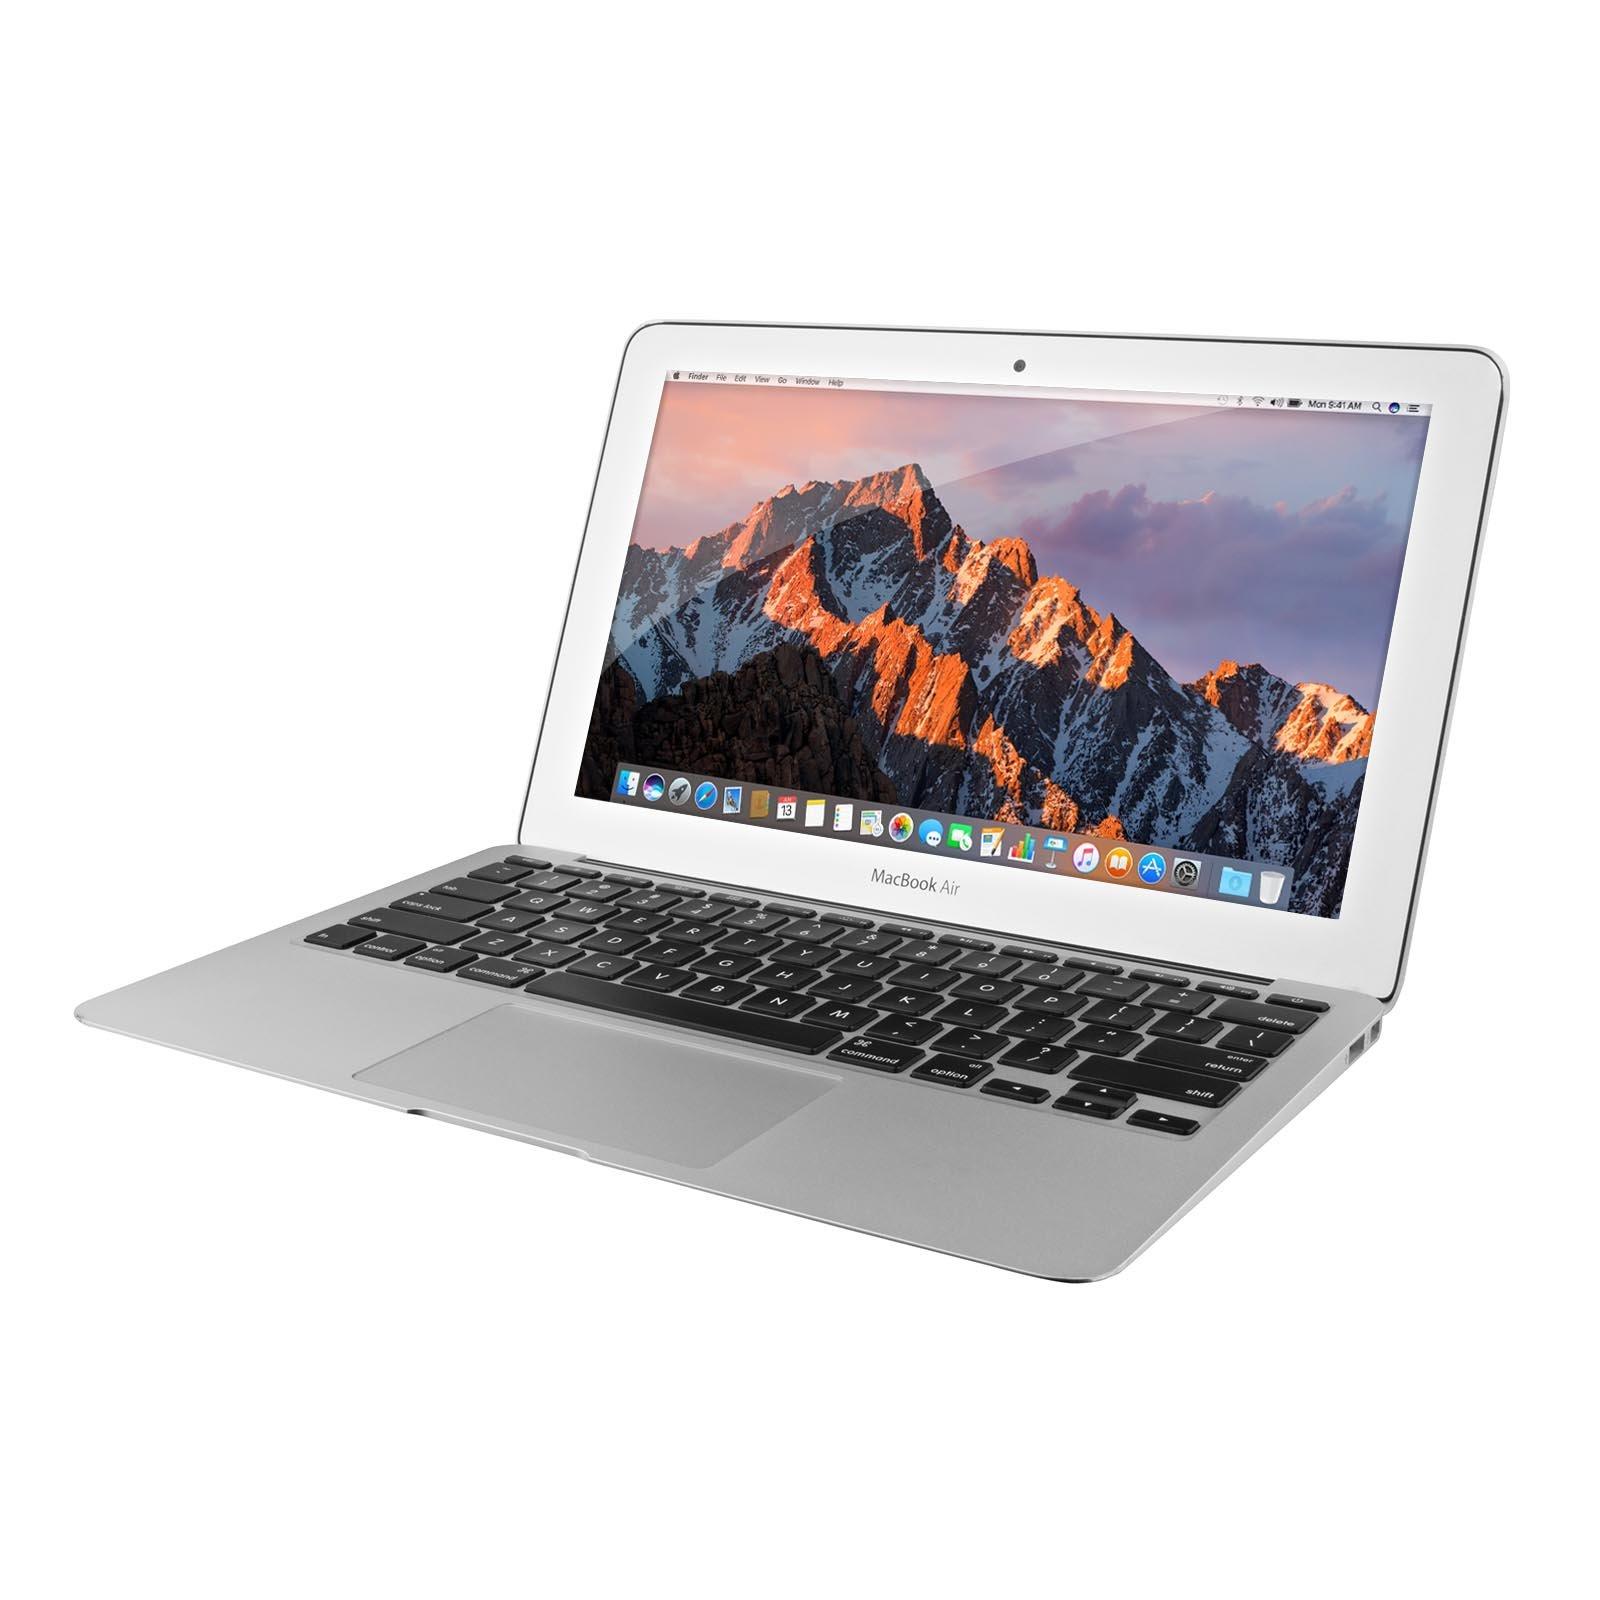 Apple MacBook Air MJVM2LL/A 11.6-Inch laptop(1.6 GHz Intel i5, 128 GB SSD, Integrated Intel HD Graphics 6000, Mac OS X Yosemite (Renewed) by Apple